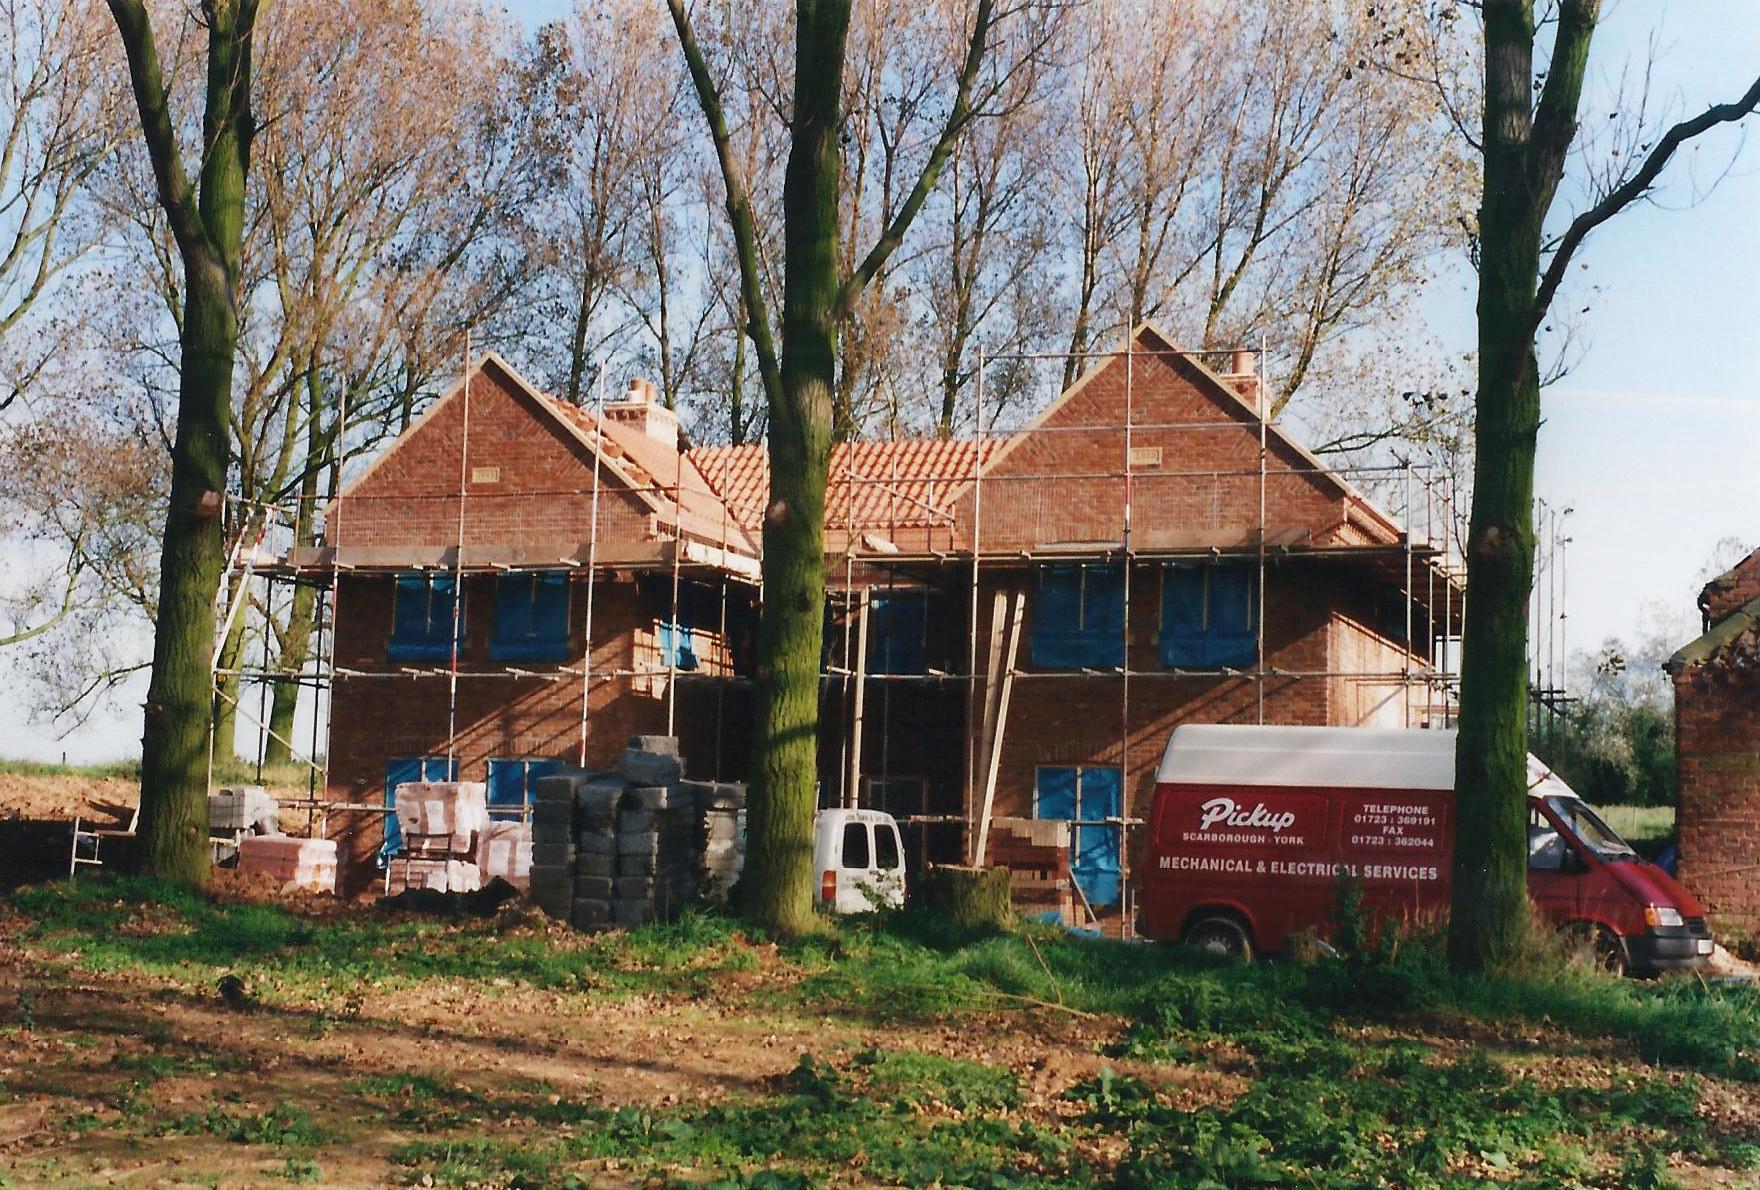 North End Farm Construction 5 - East Yorkshire Architects - Samuel Kendall Associates.jpg